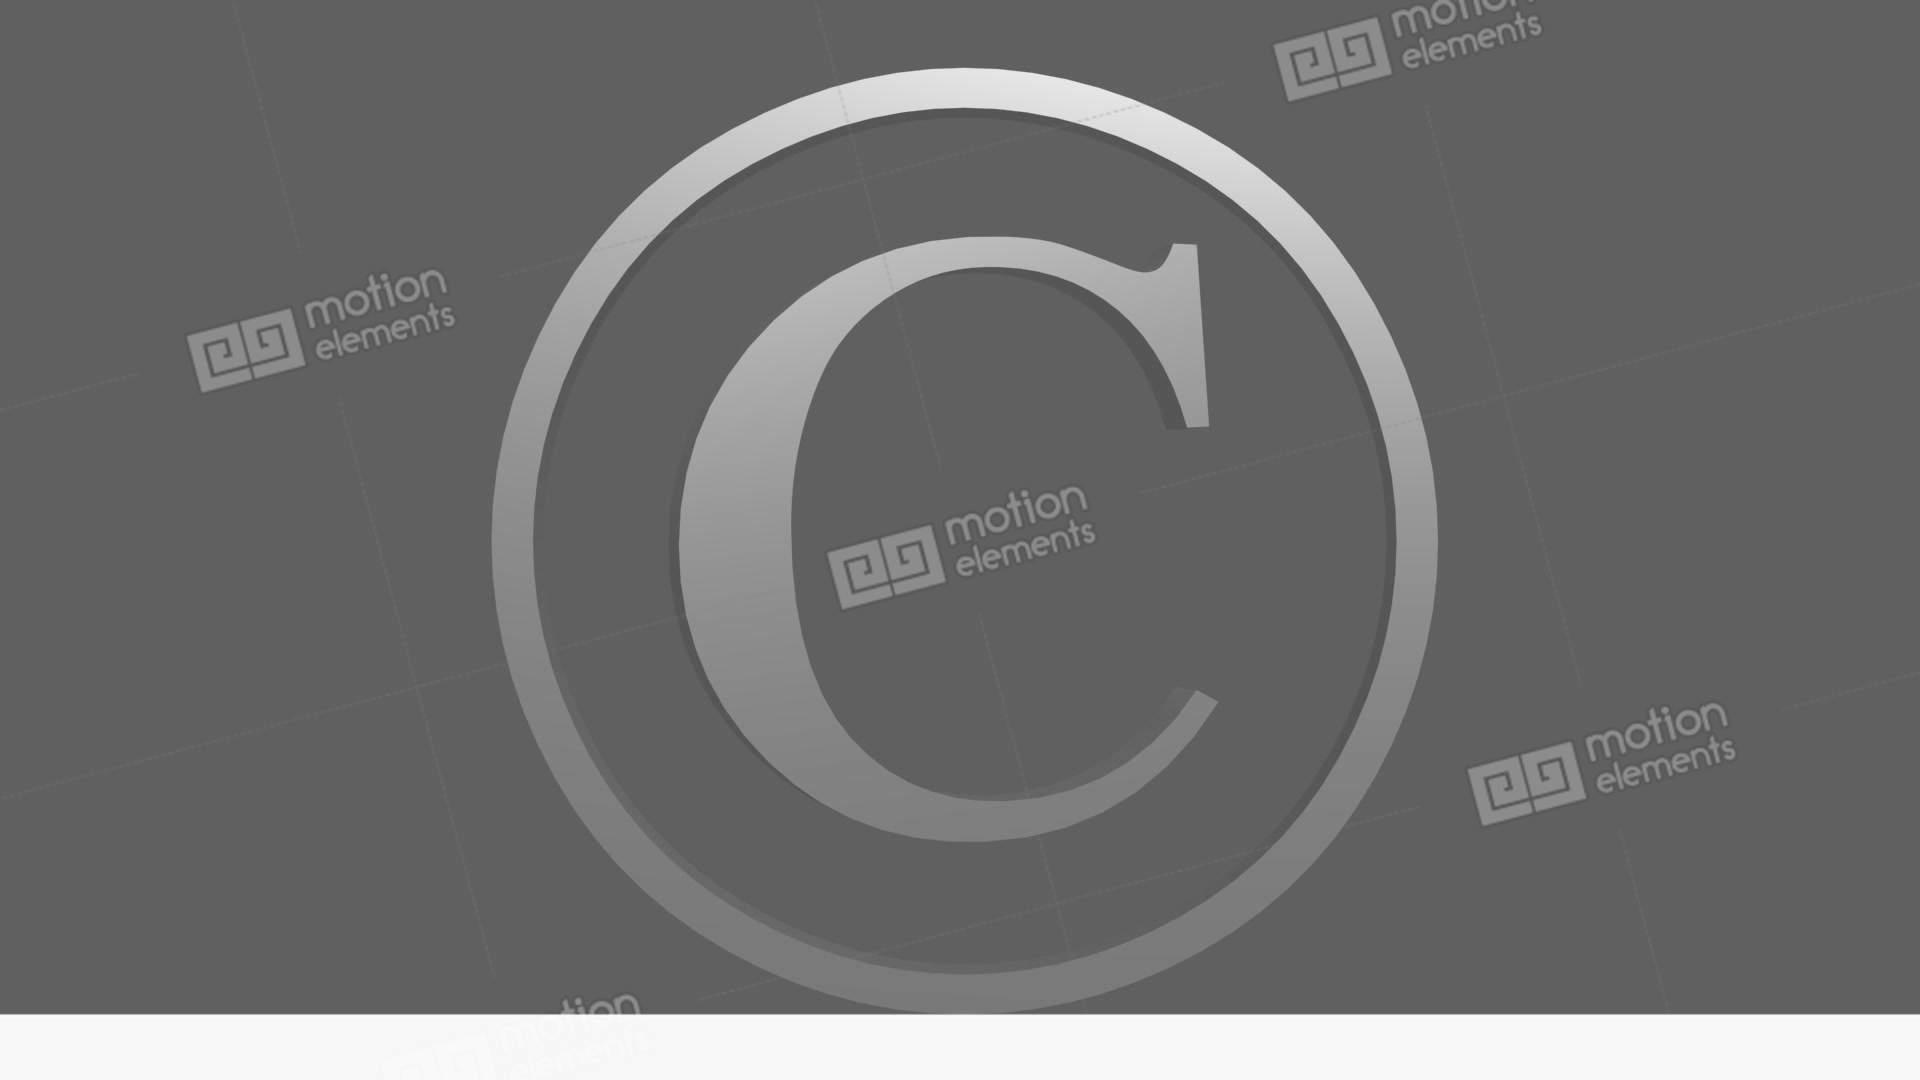 Animated Copyright Symbol 3 Stock Animation 11539294